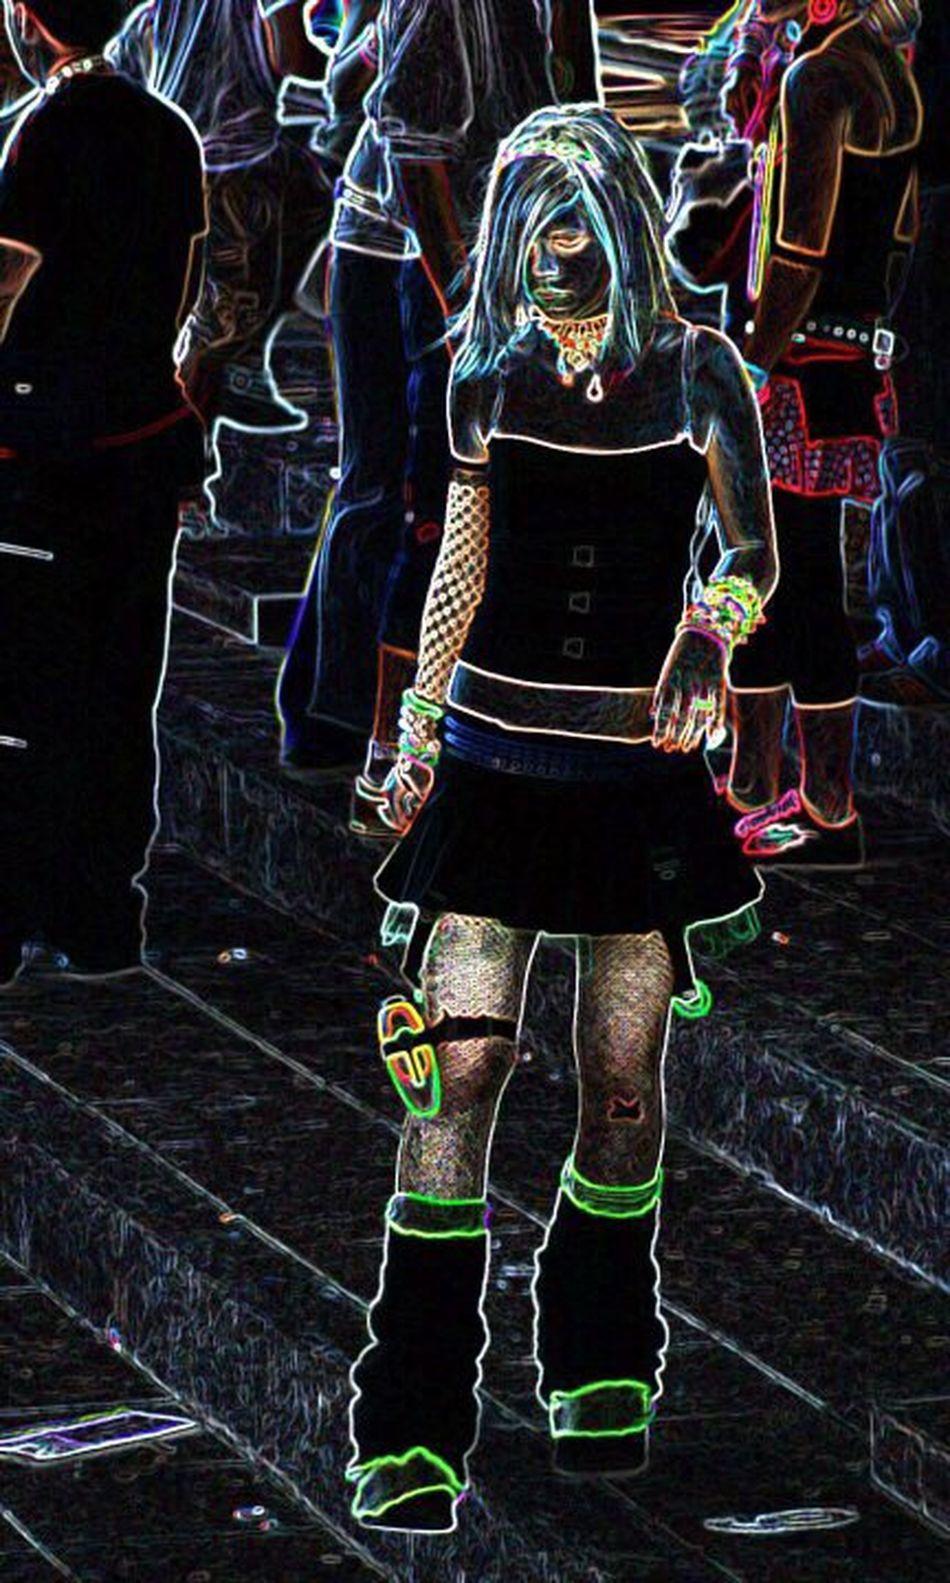 The Innovator The World Of Techno Music Techno Music Dance Culture Dance Music